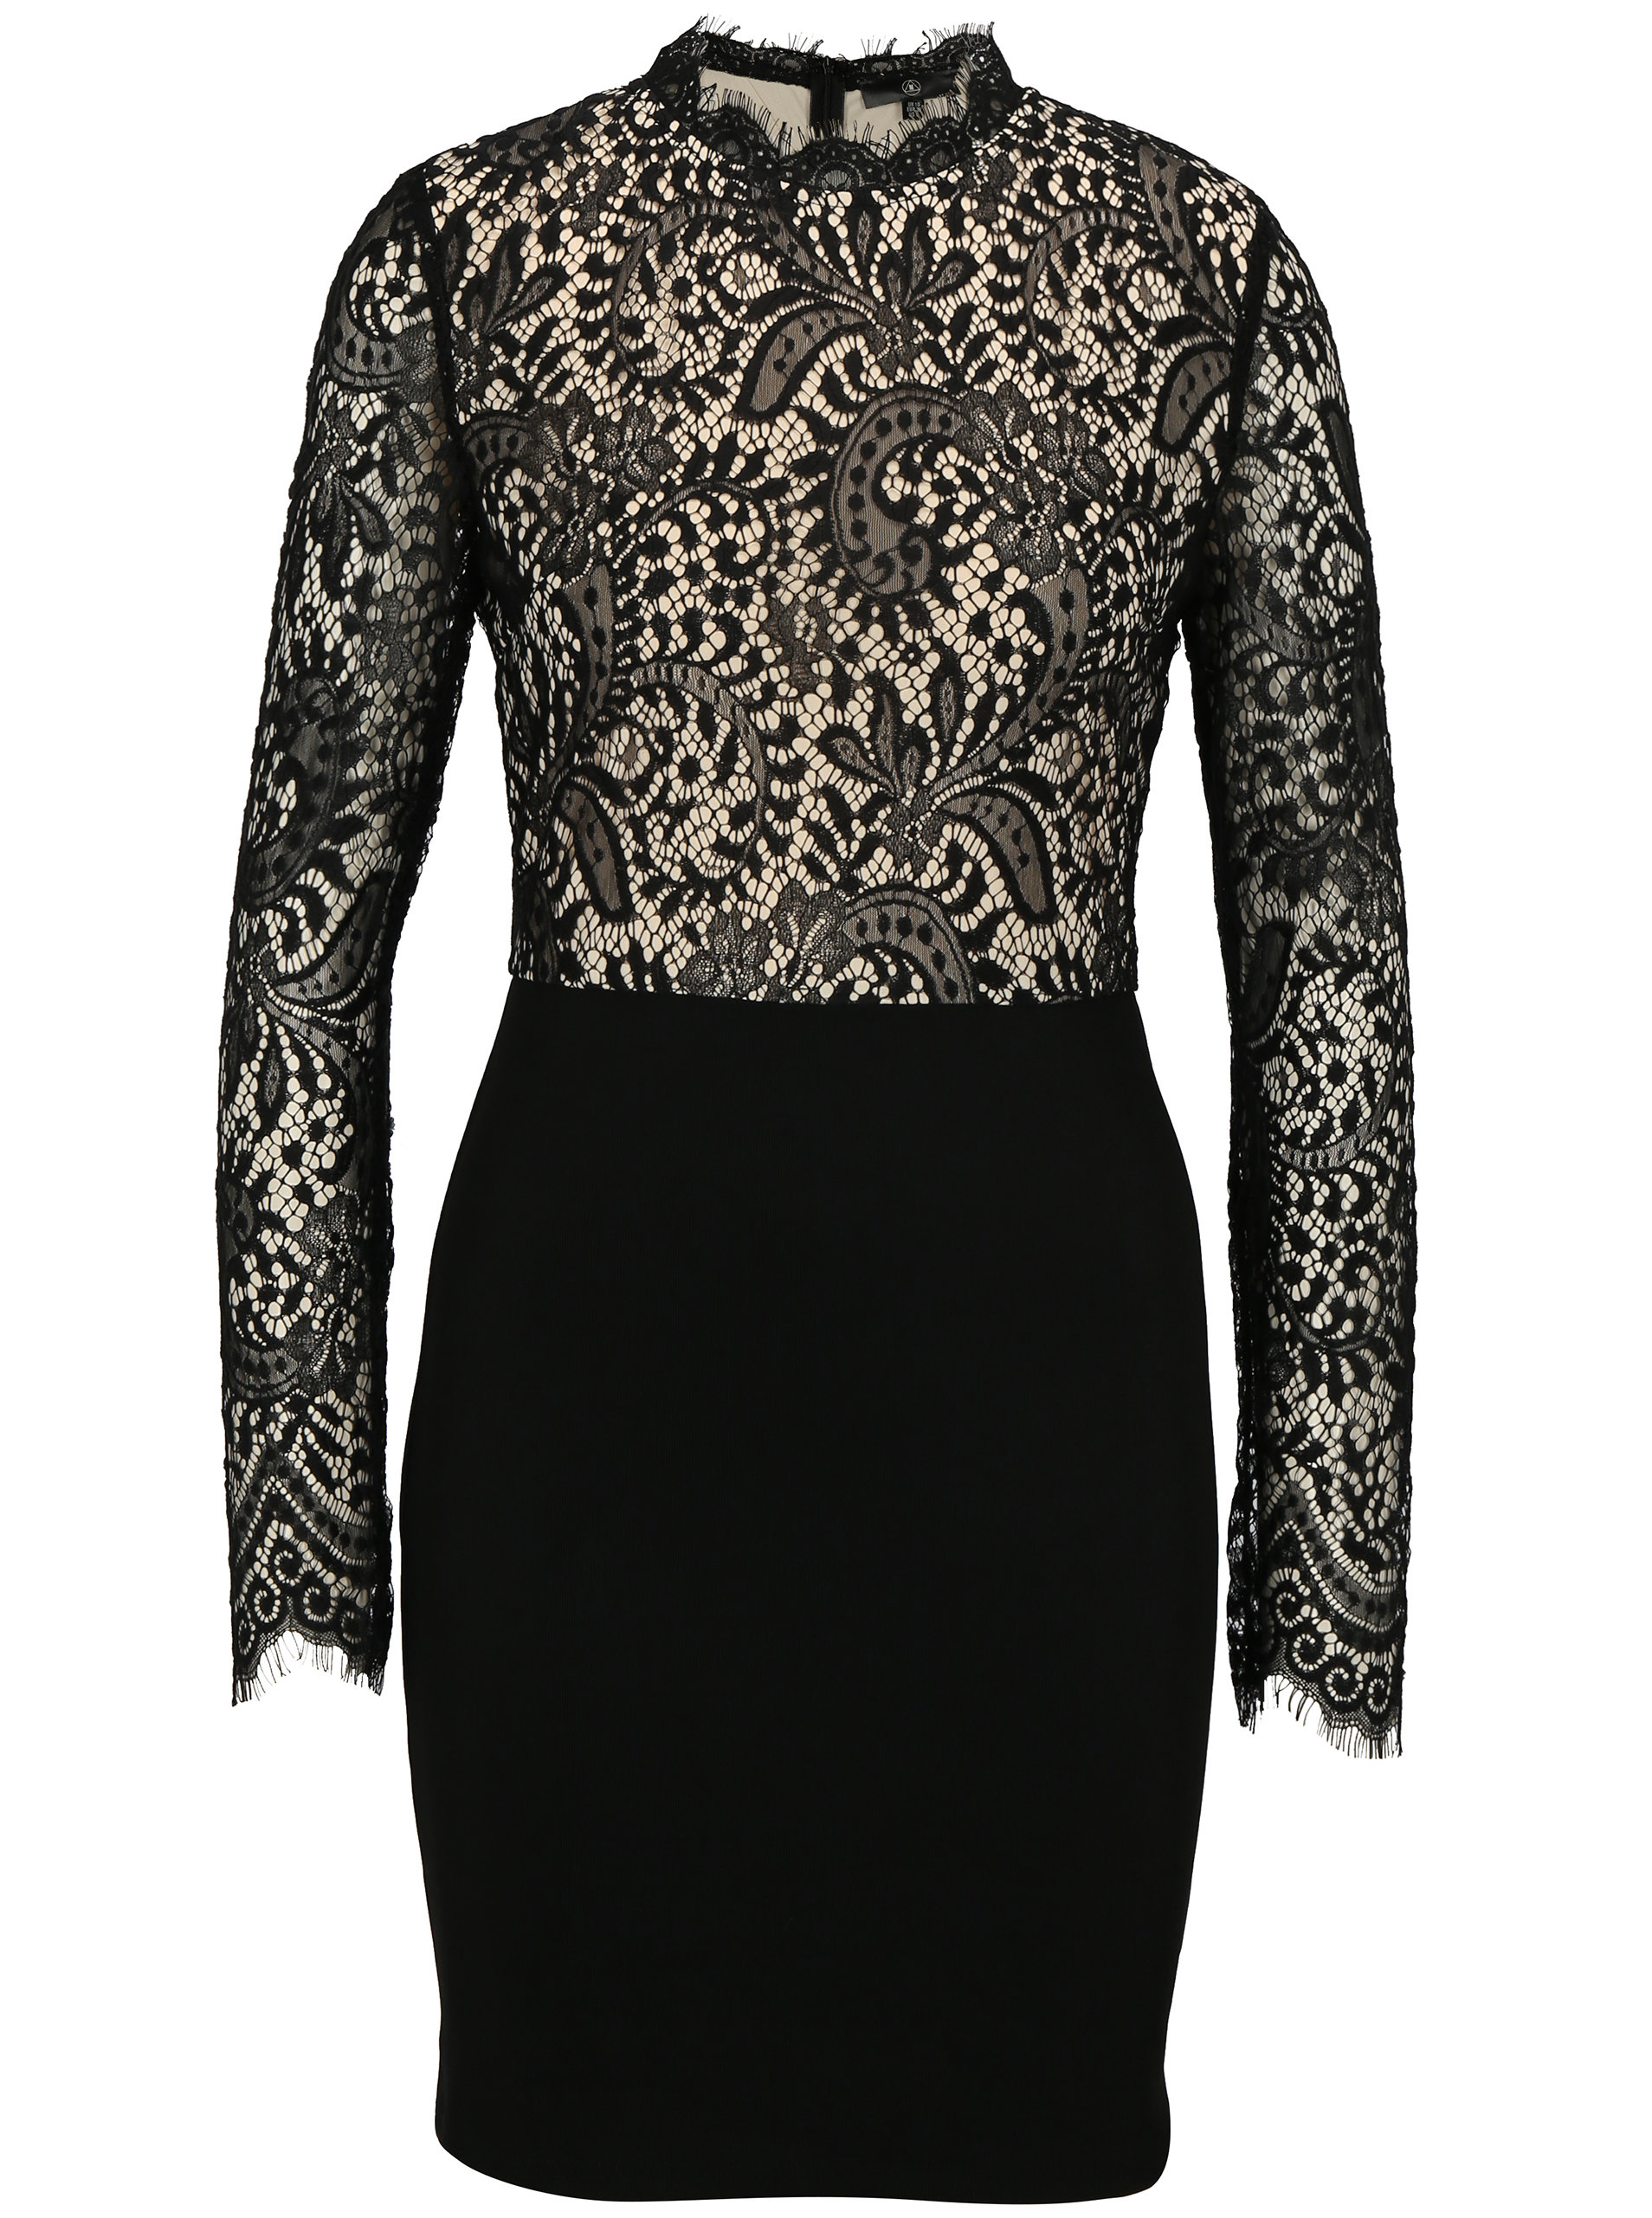 Béžovo-černé krajkové šaty s dlouhým rukávem MISSGUIDED ... 7cfc426ef2